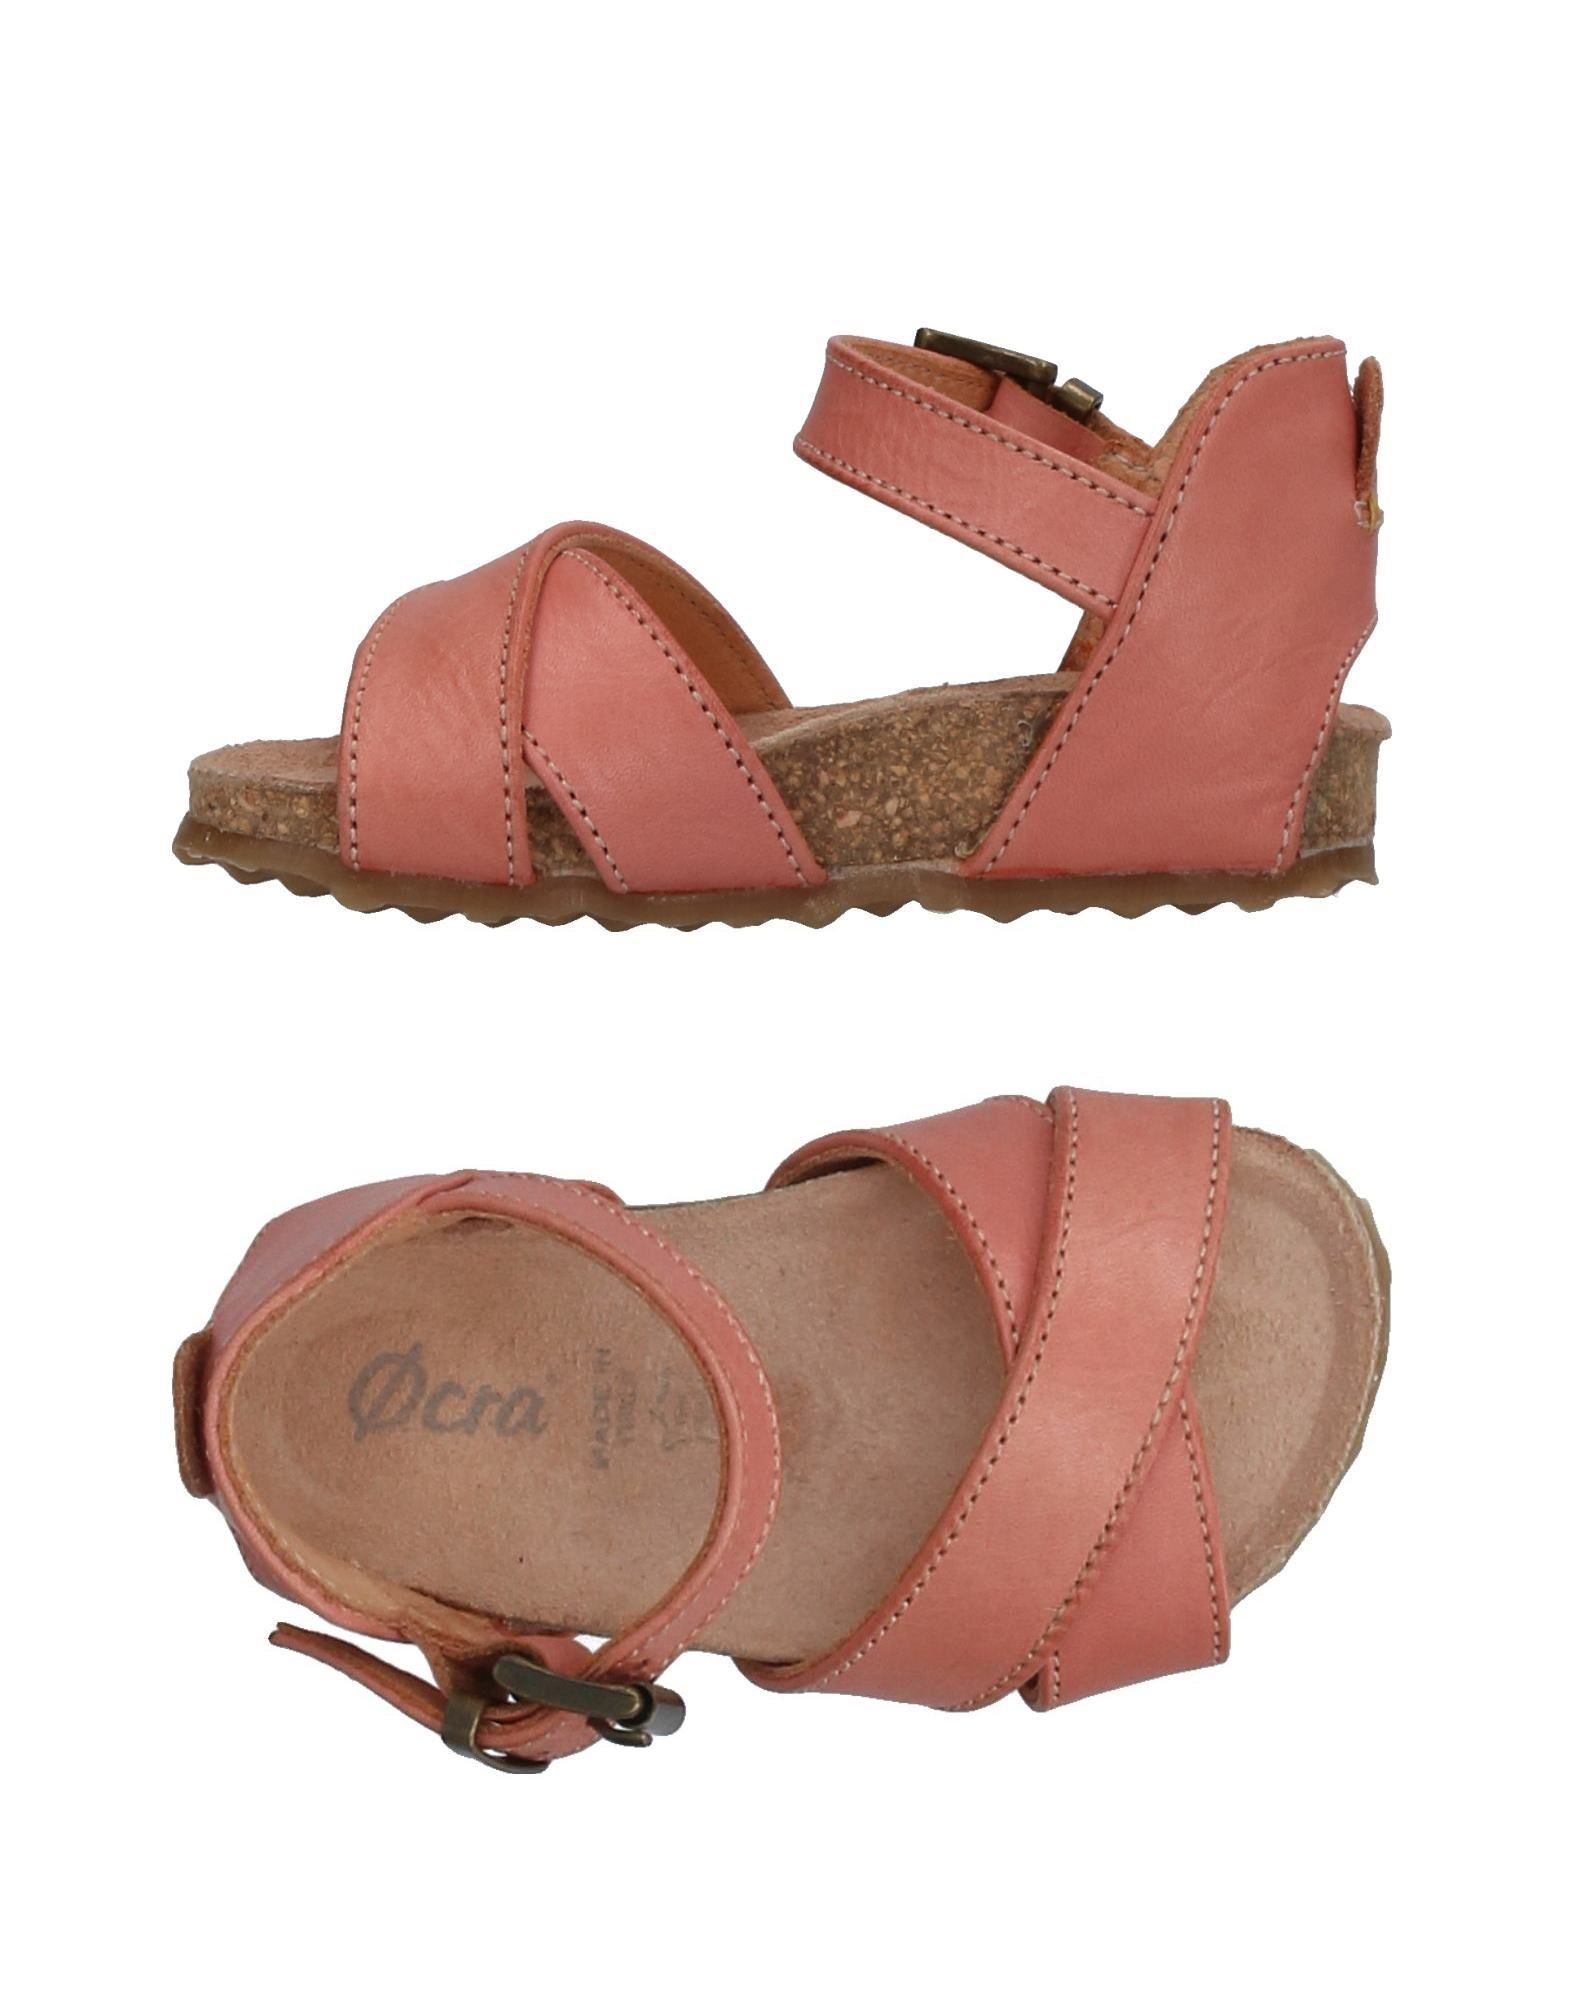 2144c67cdba Ocra Sandals Girl 0-24 months online on YOOX United States